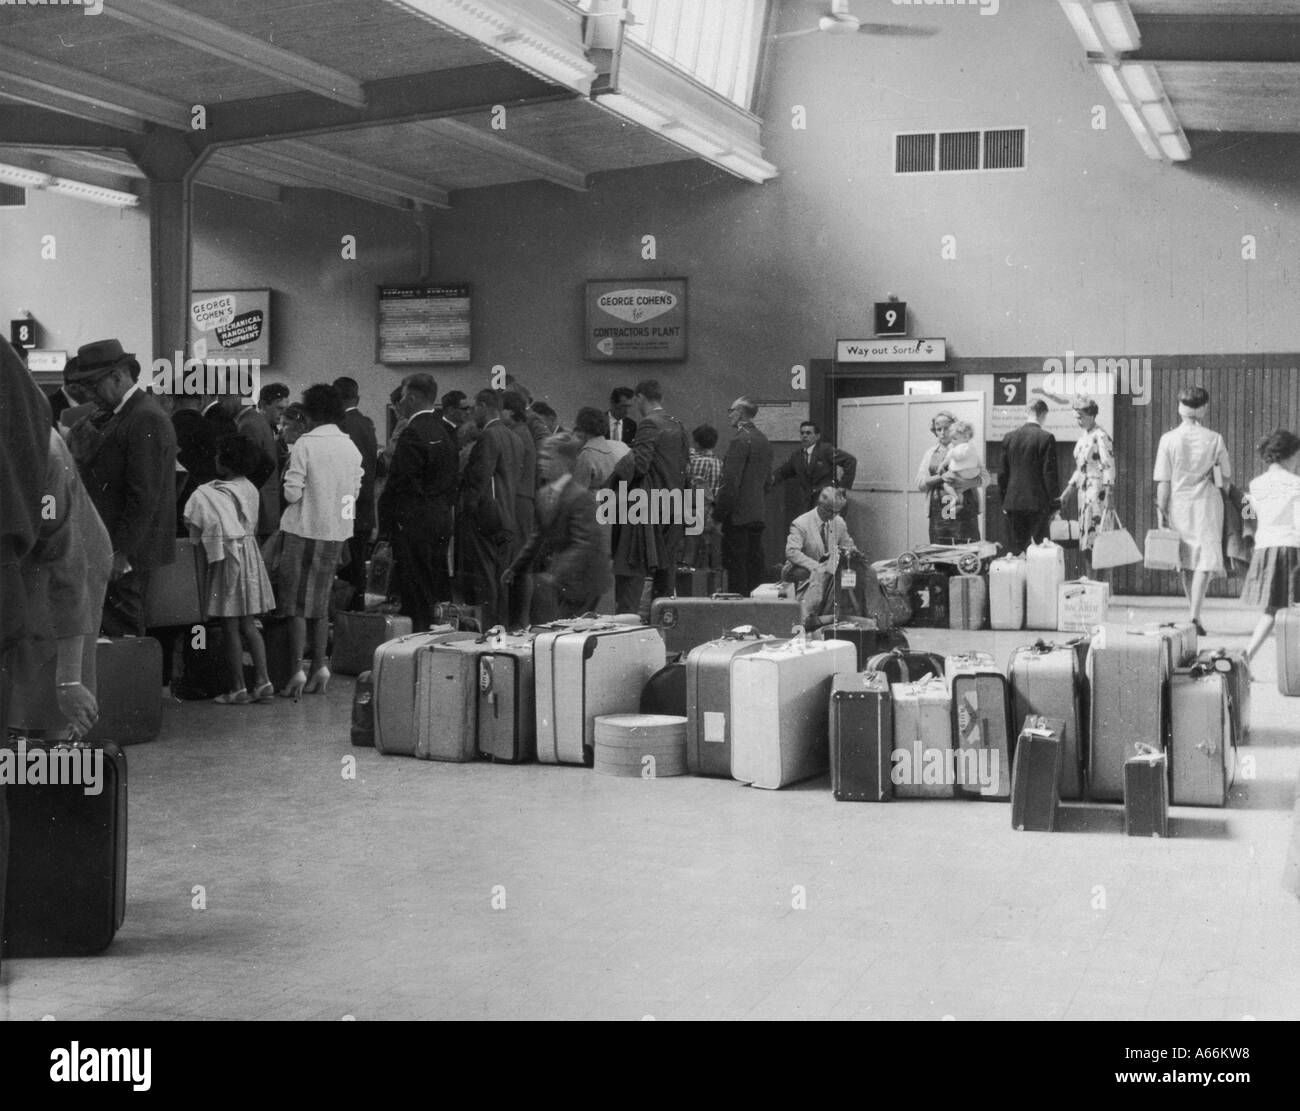 Customs At Heathrow - Stock Image